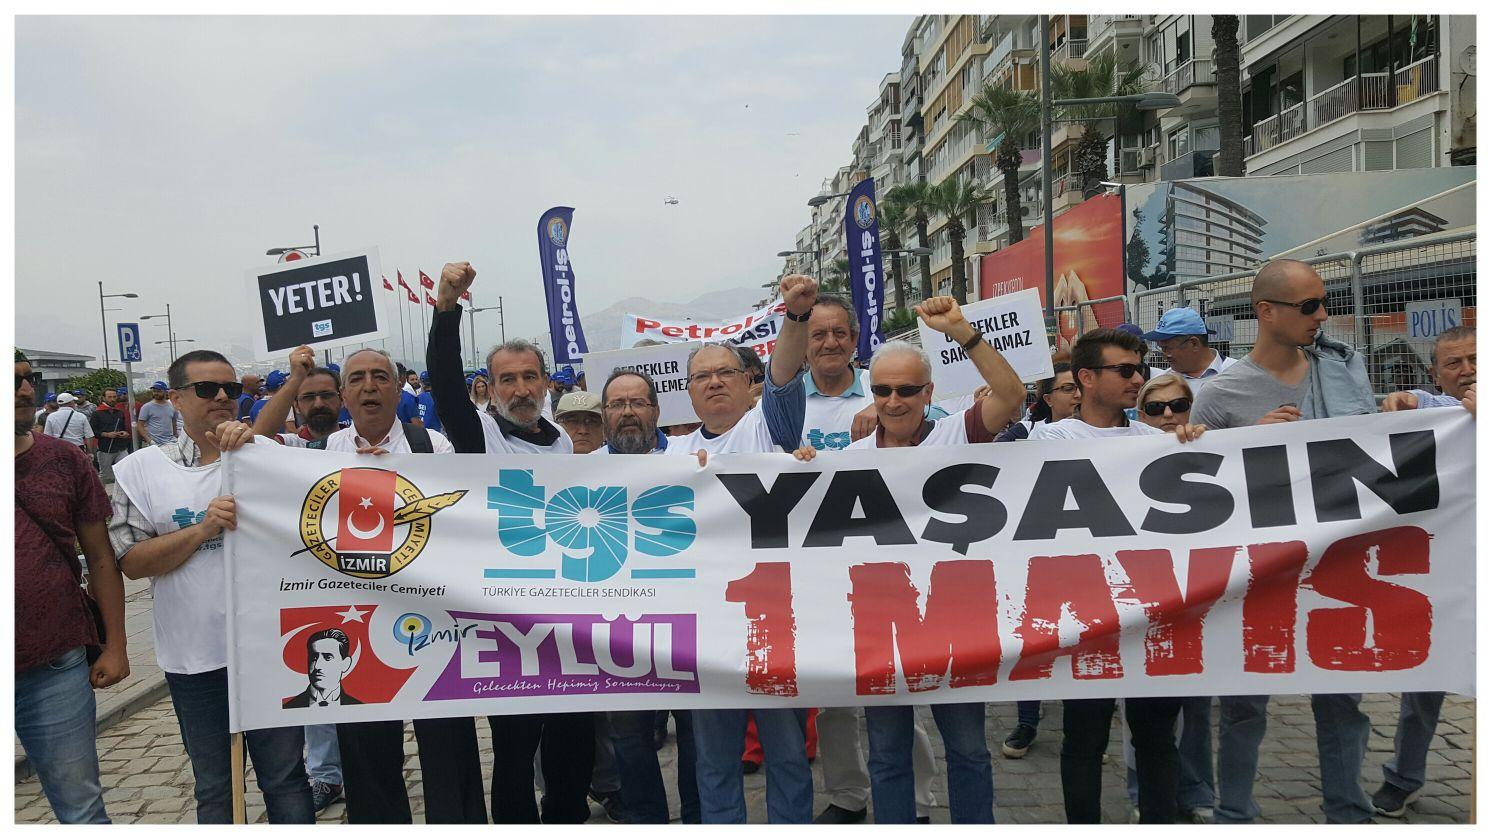 İzmir'de 1 Mayıs coşkusu 1